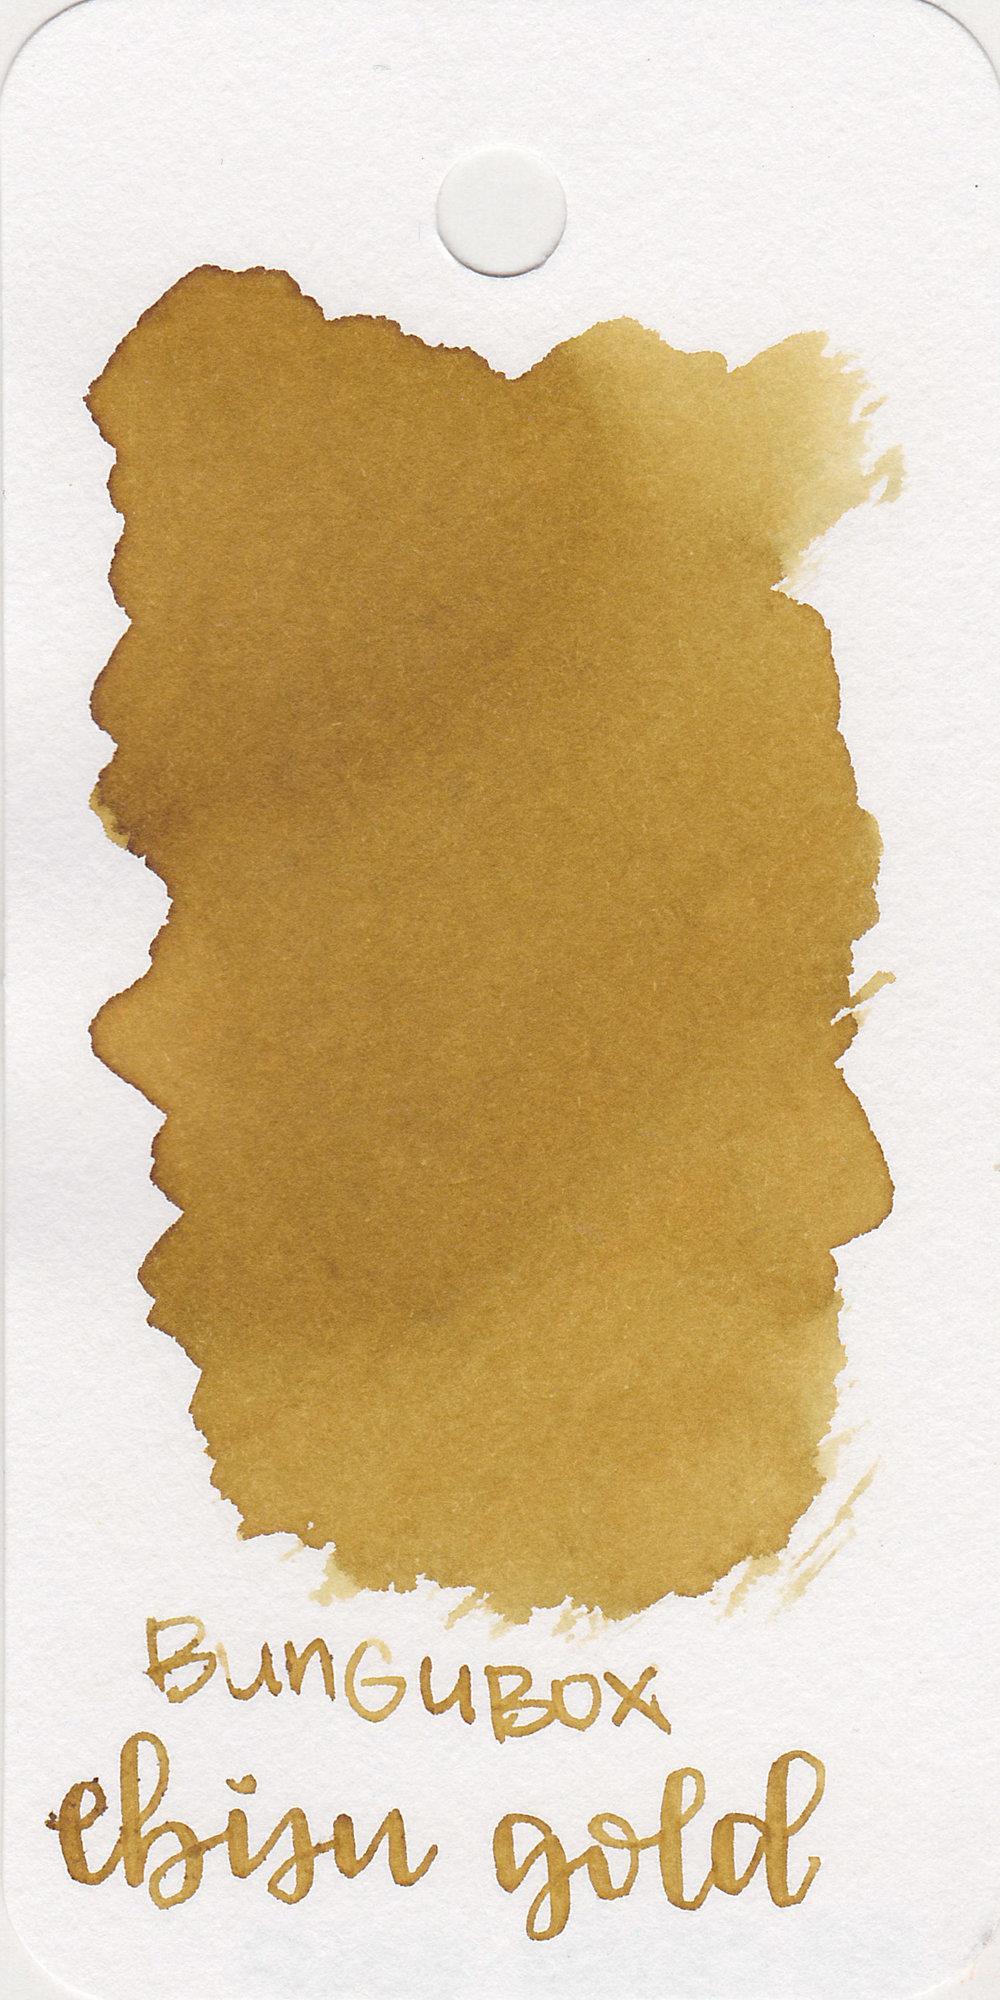 The color: - Ebisu Gold is a cool-tone dark yellow.